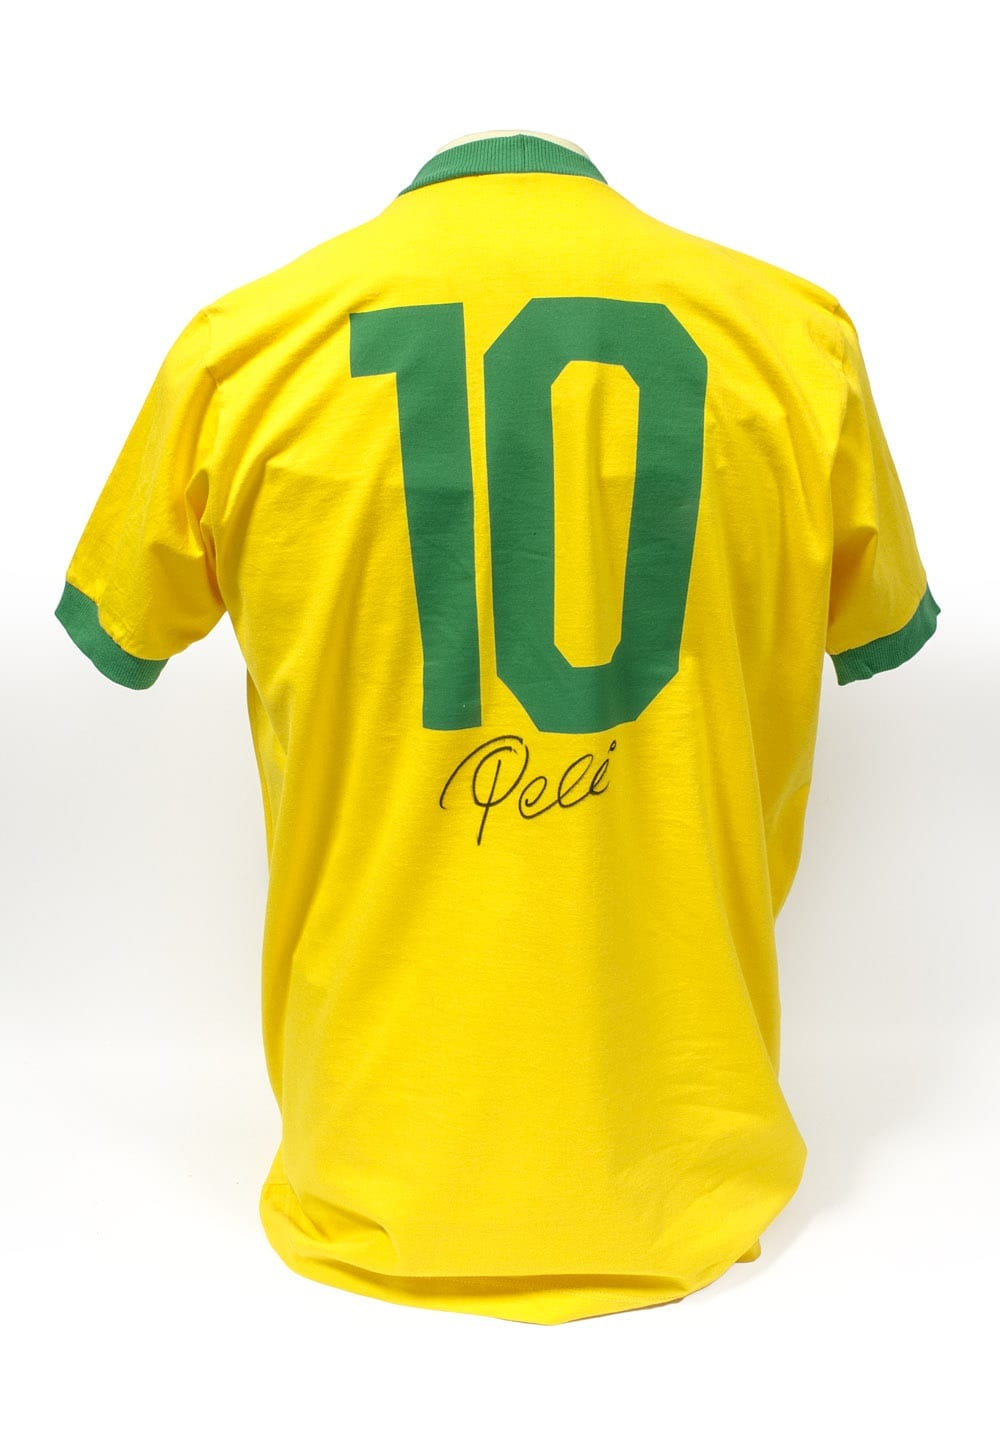 93caab7b5 Pele Brazil Signed Shirt - Unframed